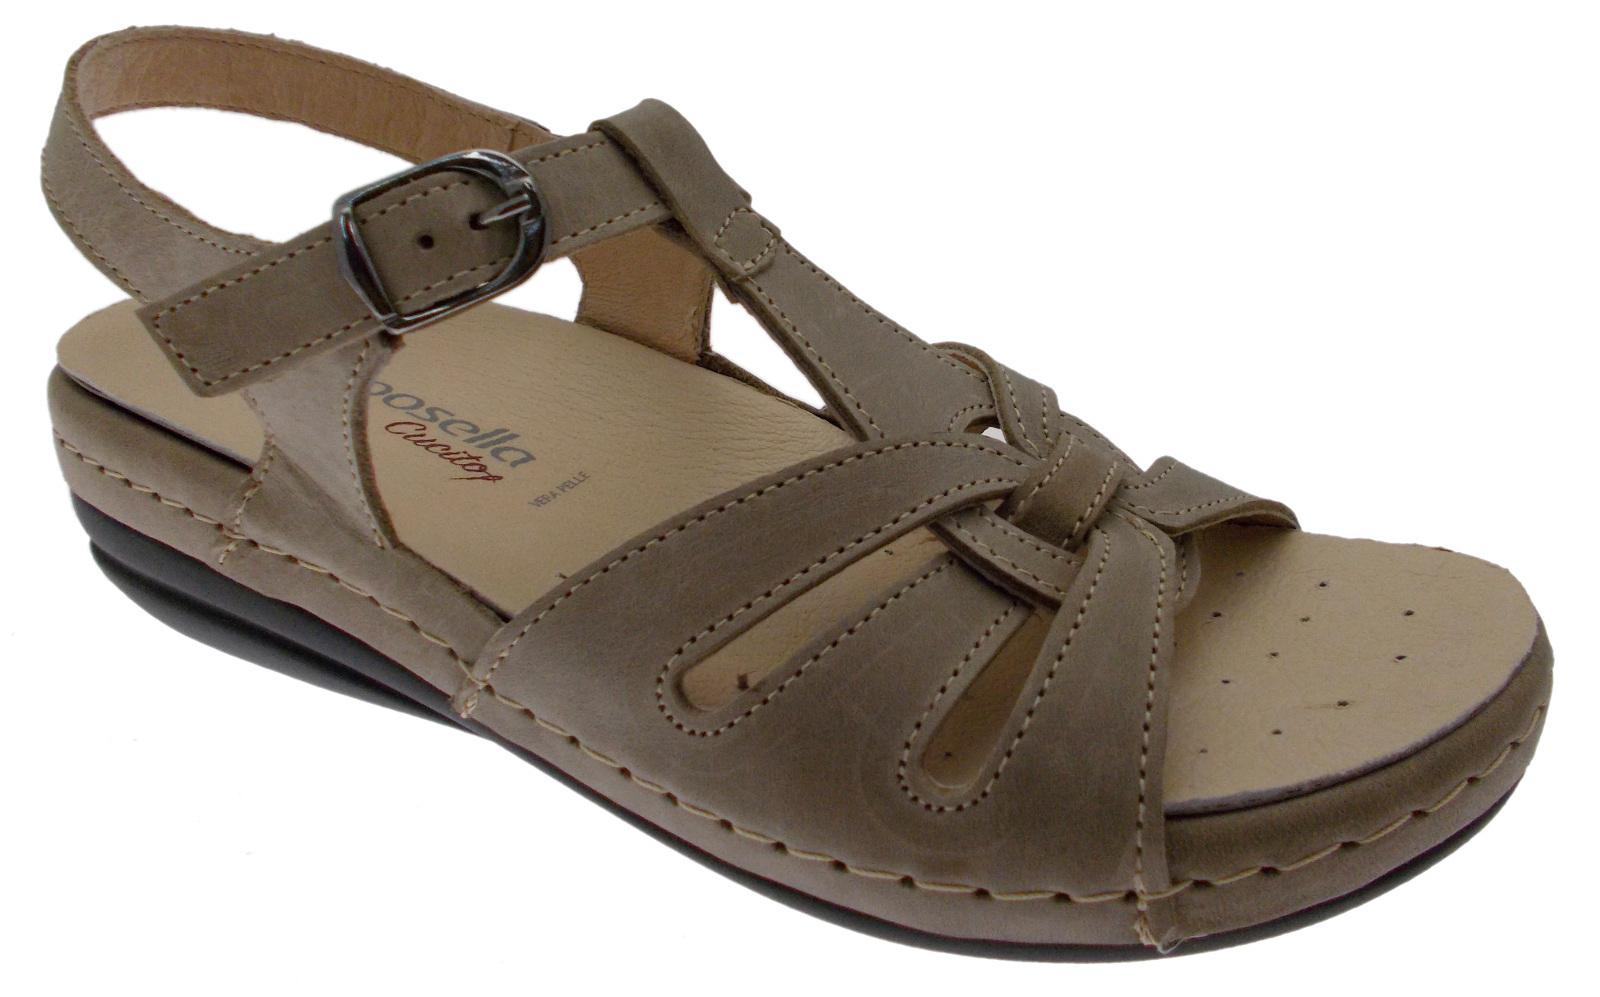 9514 taupe sandalo sandalo sandalo con soletta rimovibile ORTOPEDICO Riposella 6ba38c